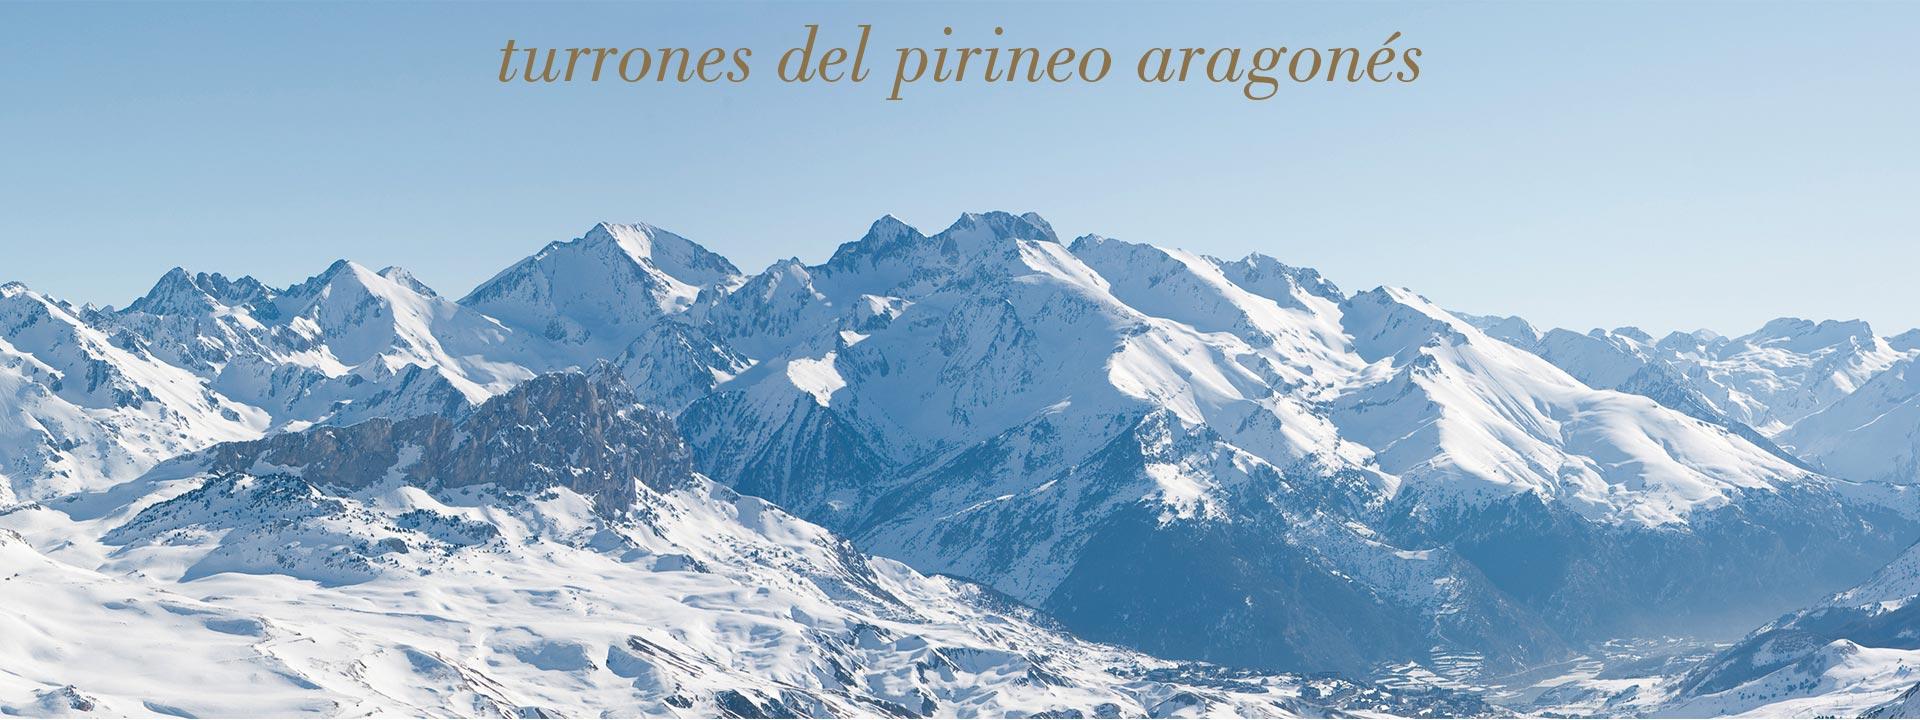 Turrones del pirineo aragonés